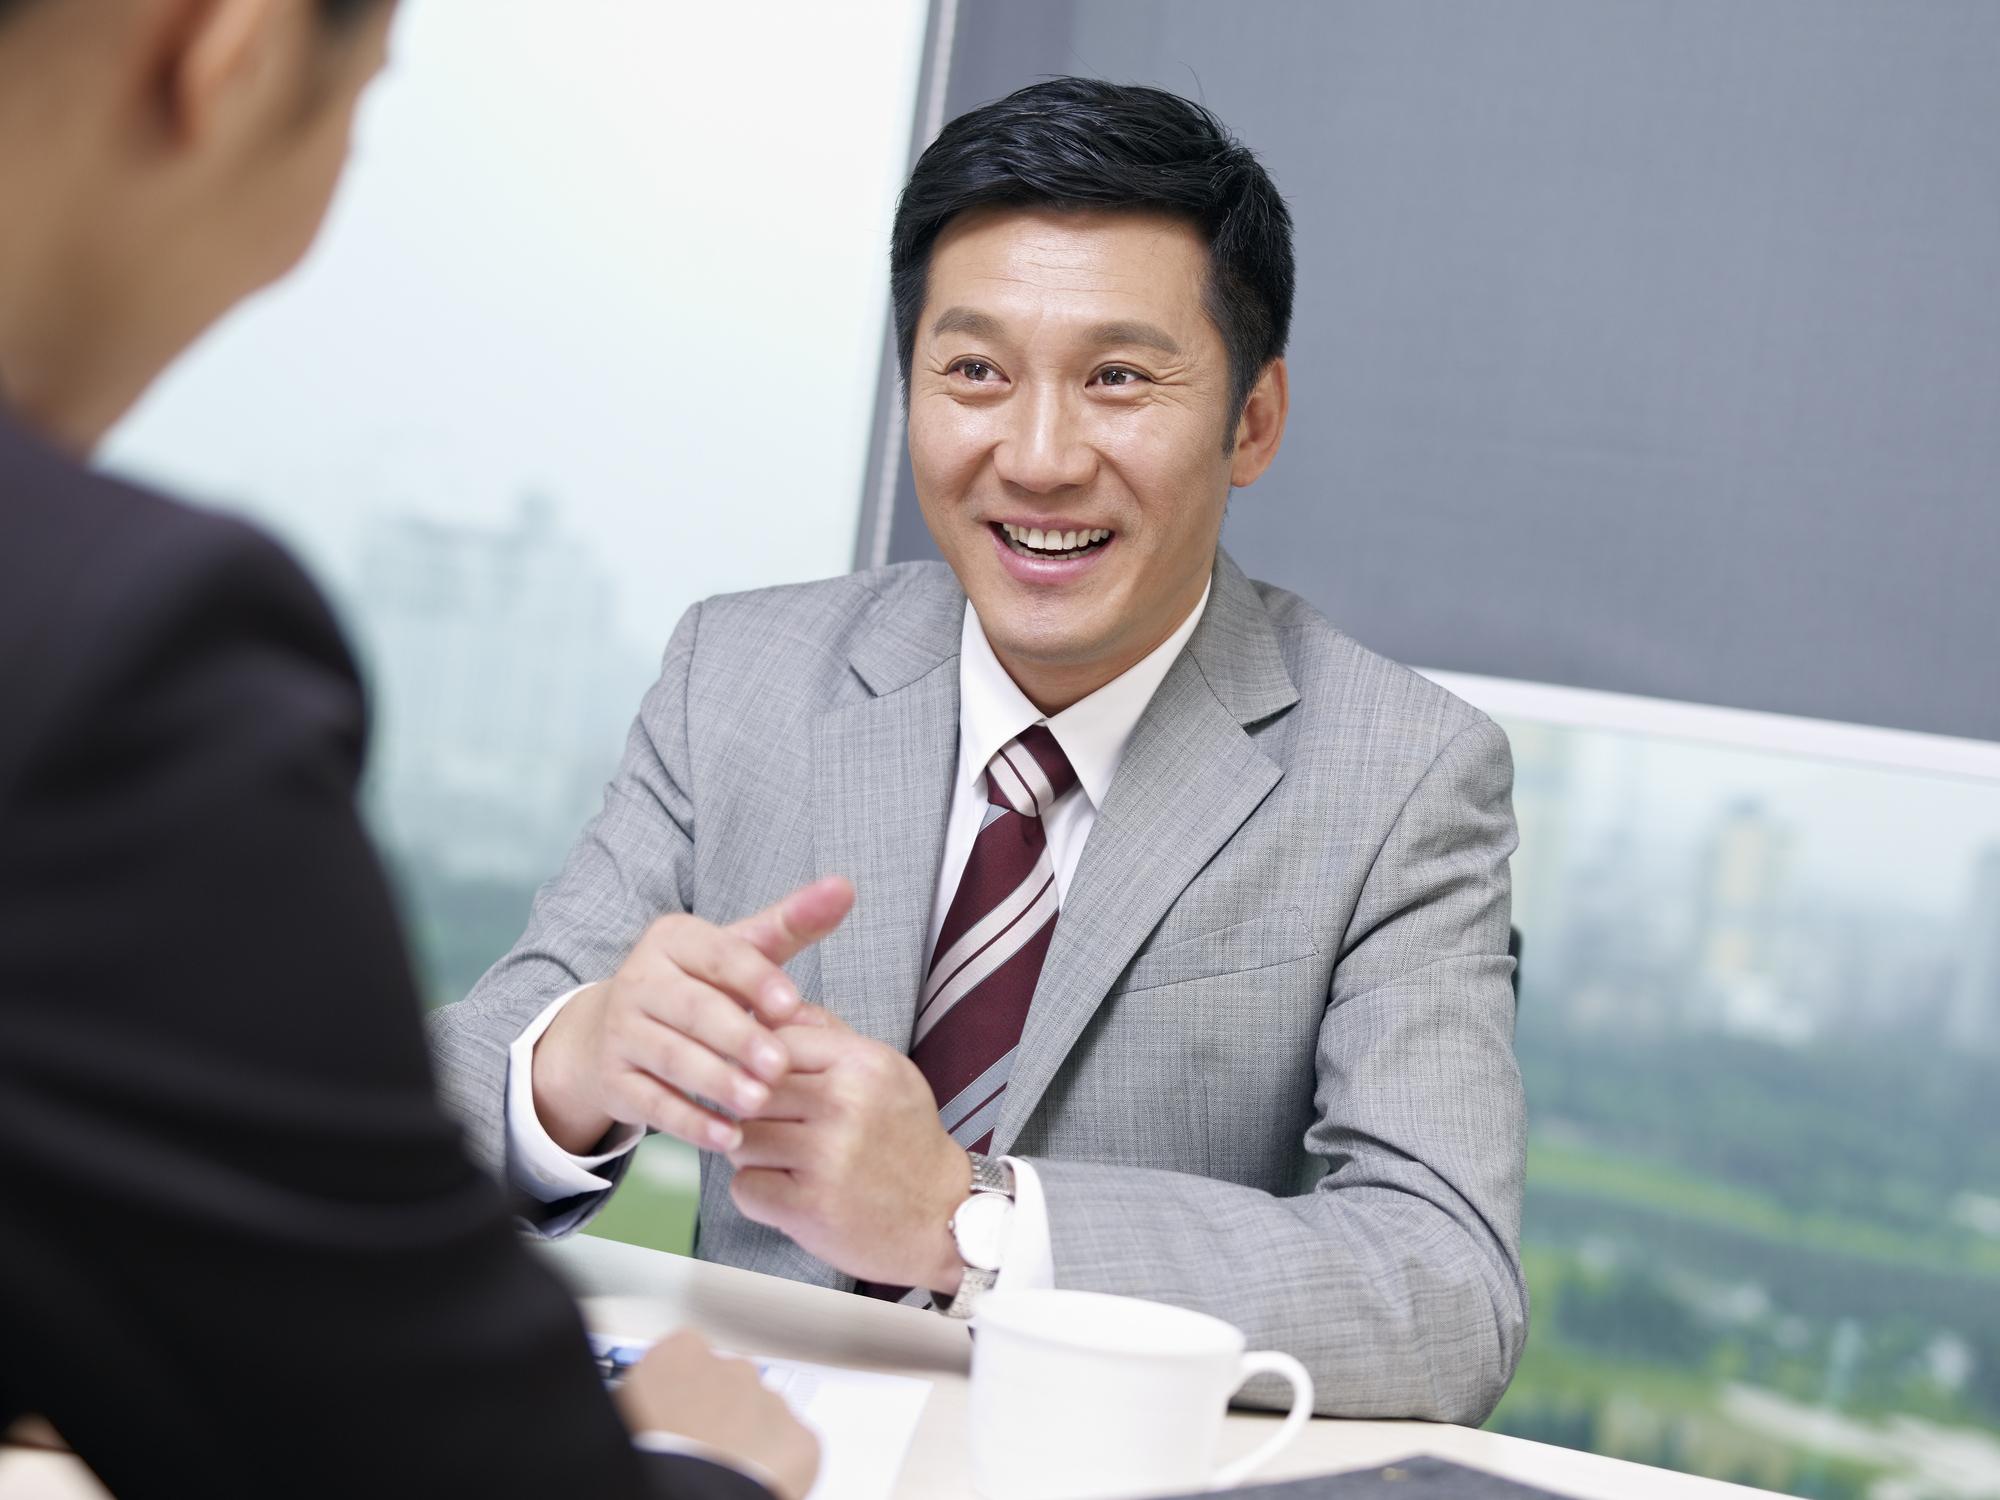 Stock photo of a happy salesman